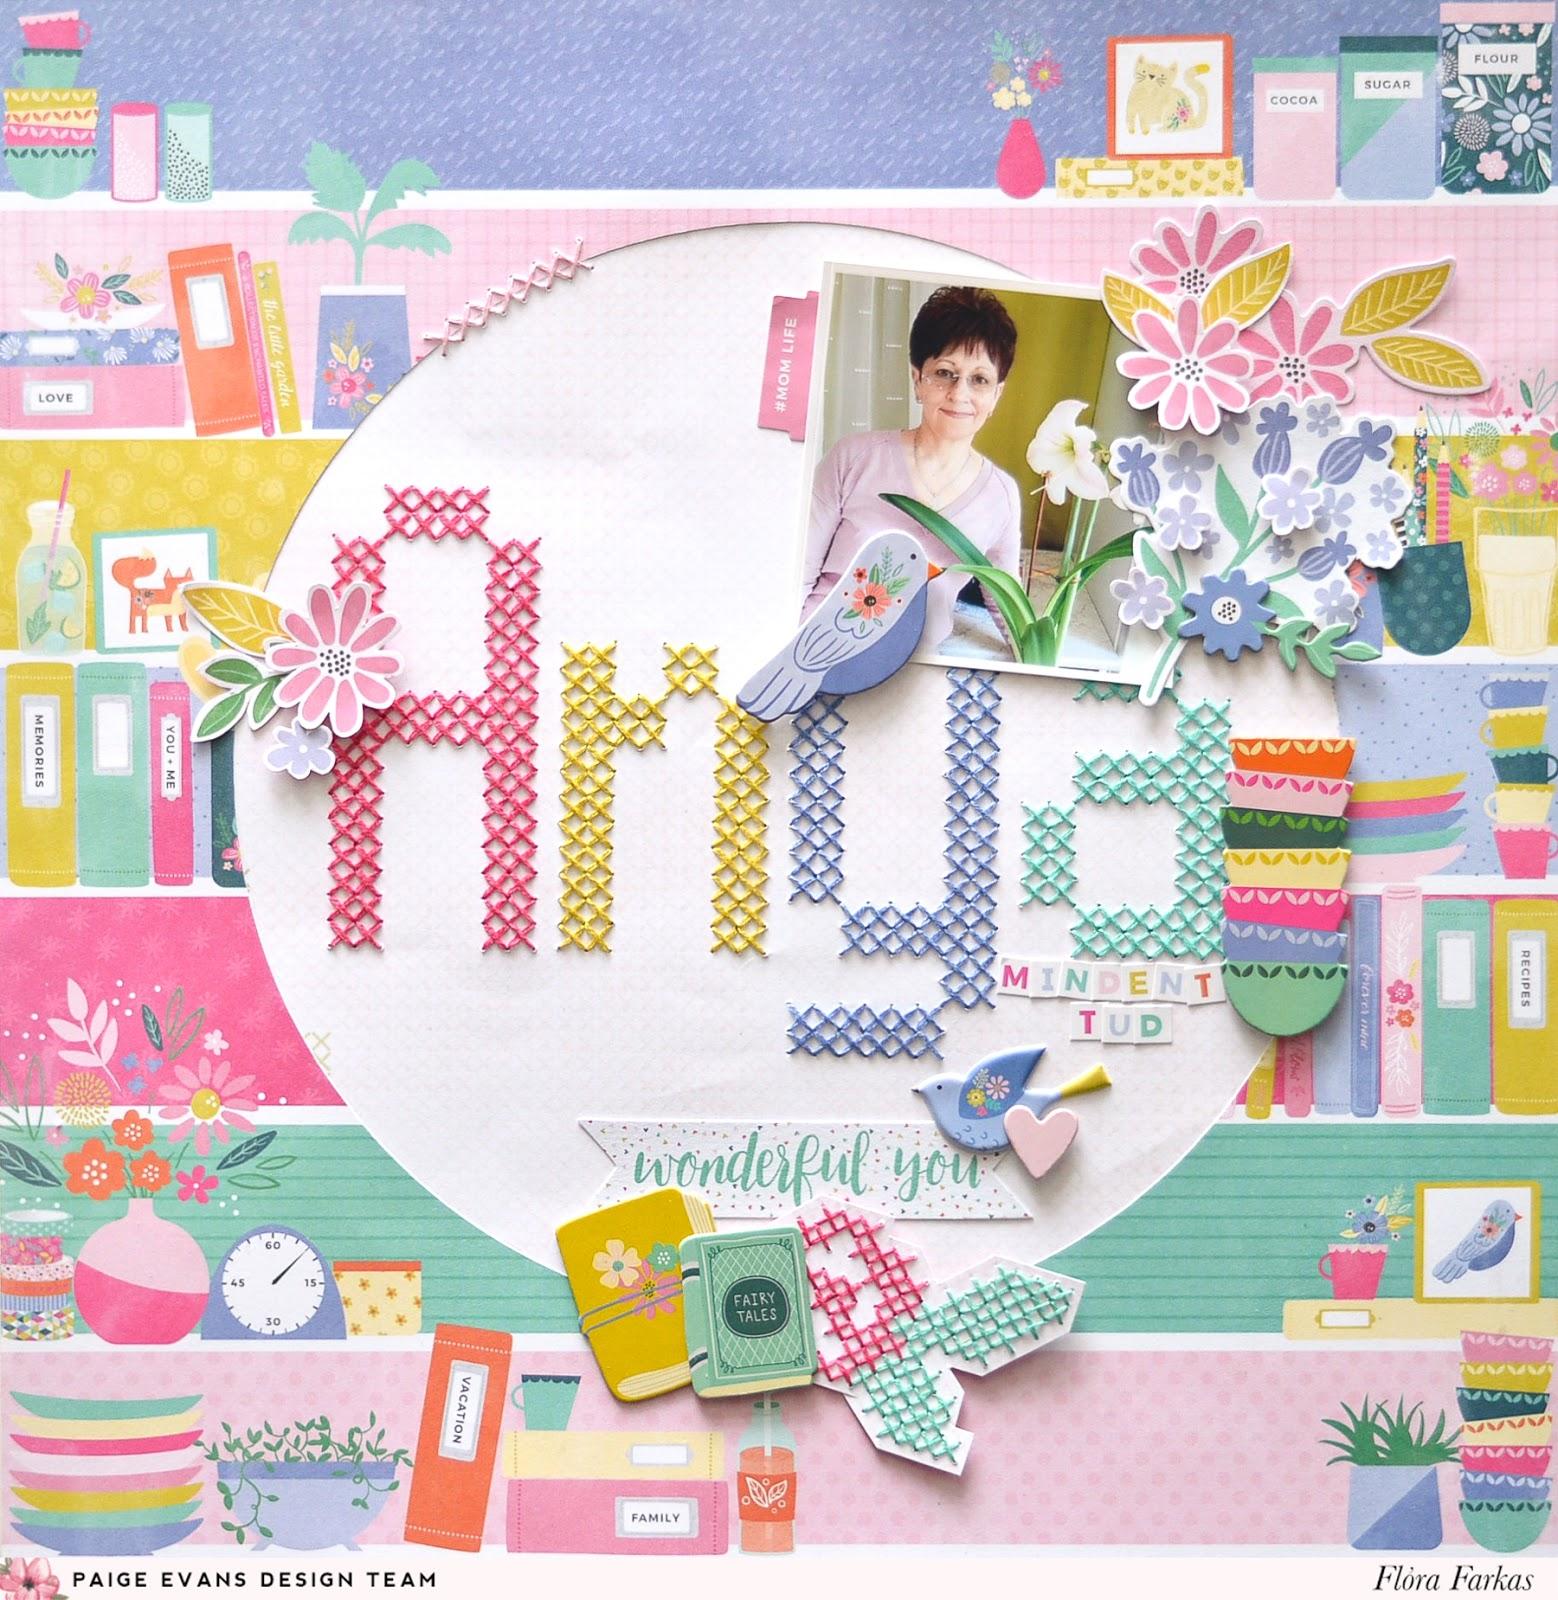 Cross stitching and scrapbooking - Paige Evans | Flóra Mónika Farkas